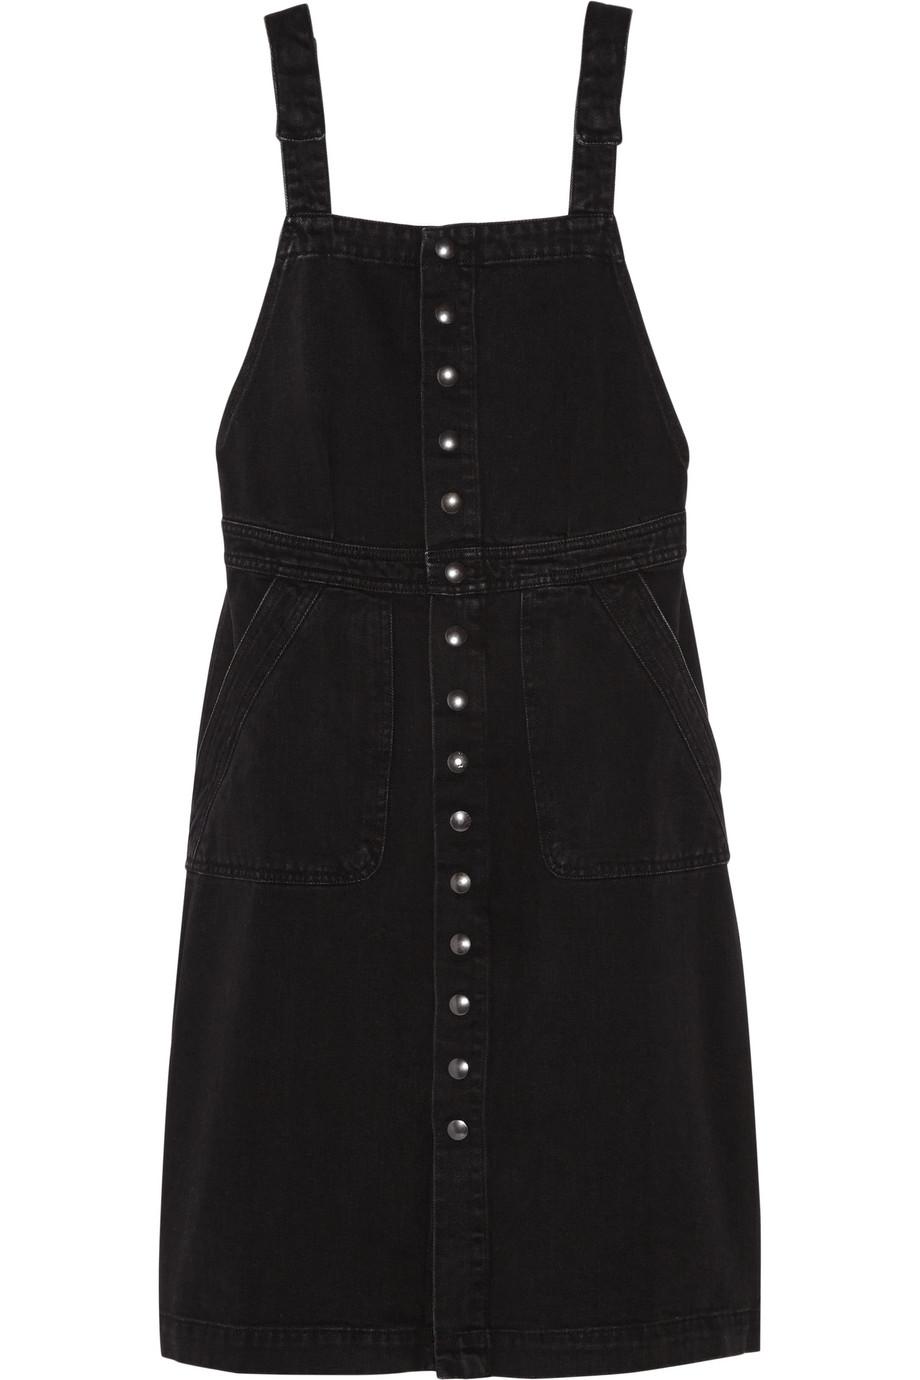 Eastman Denim Dress, Black, Women's, Size: L